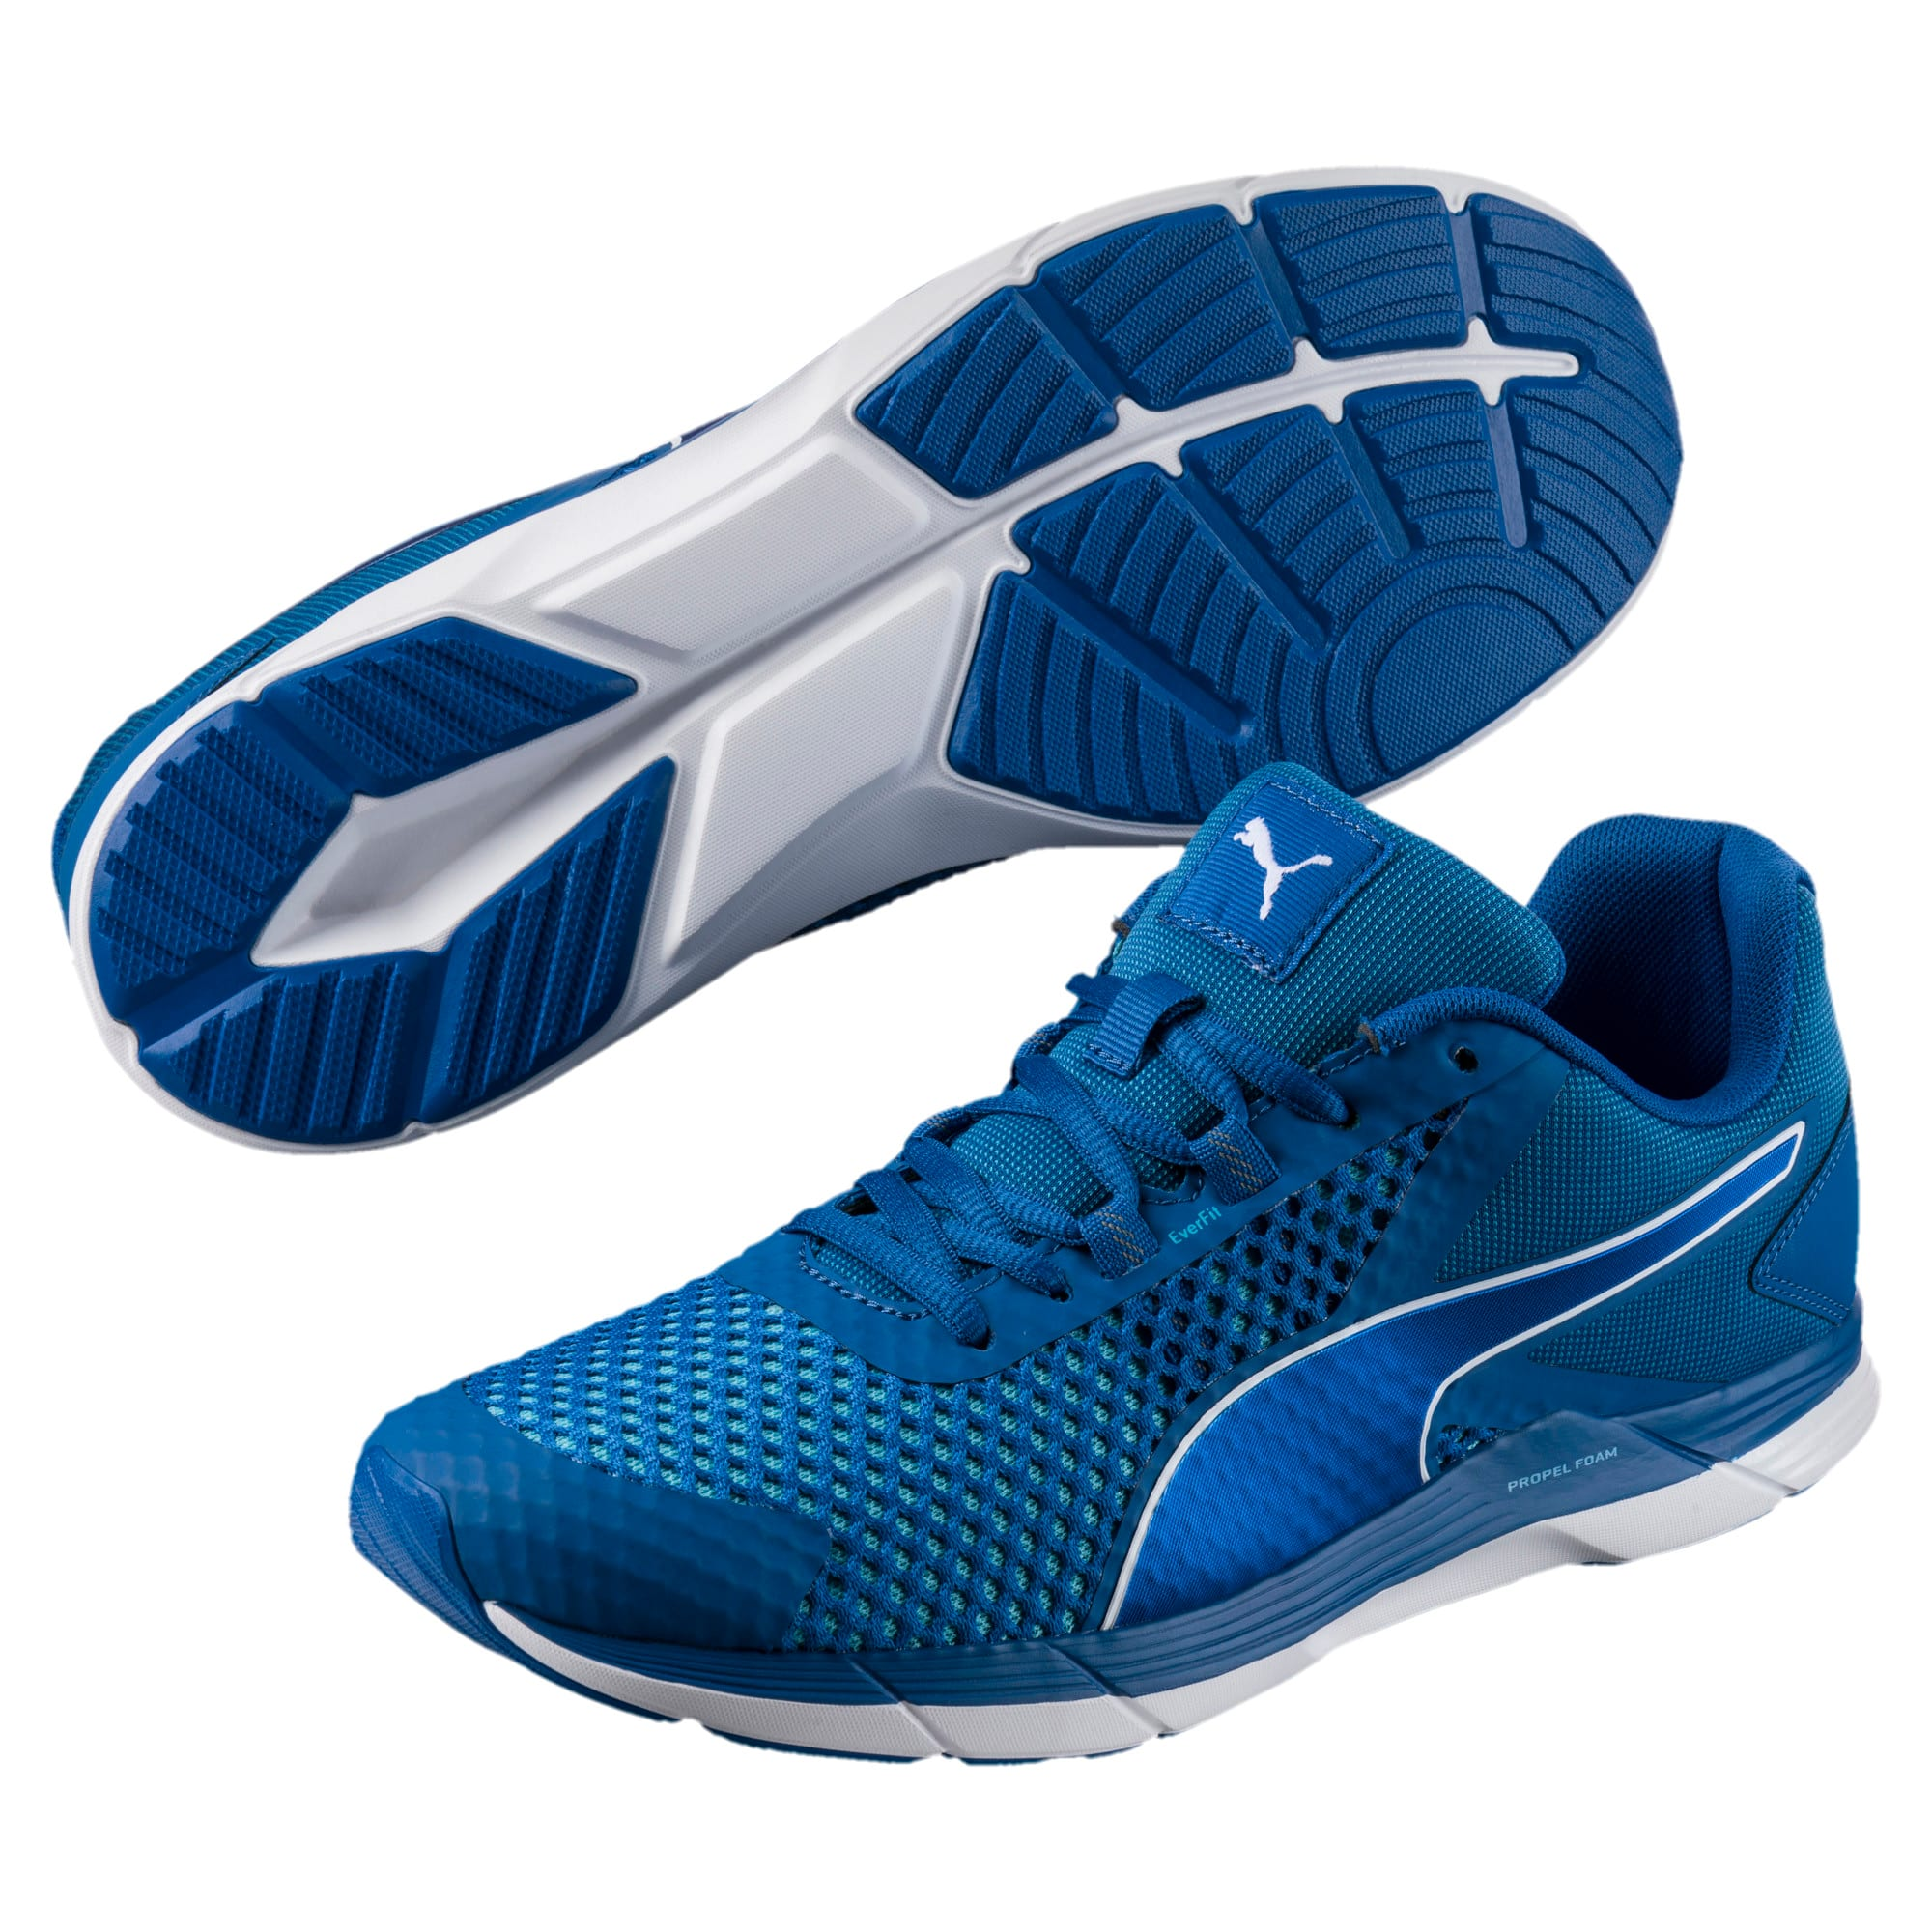 Thumbnail 2 of Propel 2 Men's Running Shoes, Lapis Blue-Turquoise-White, medium-IND